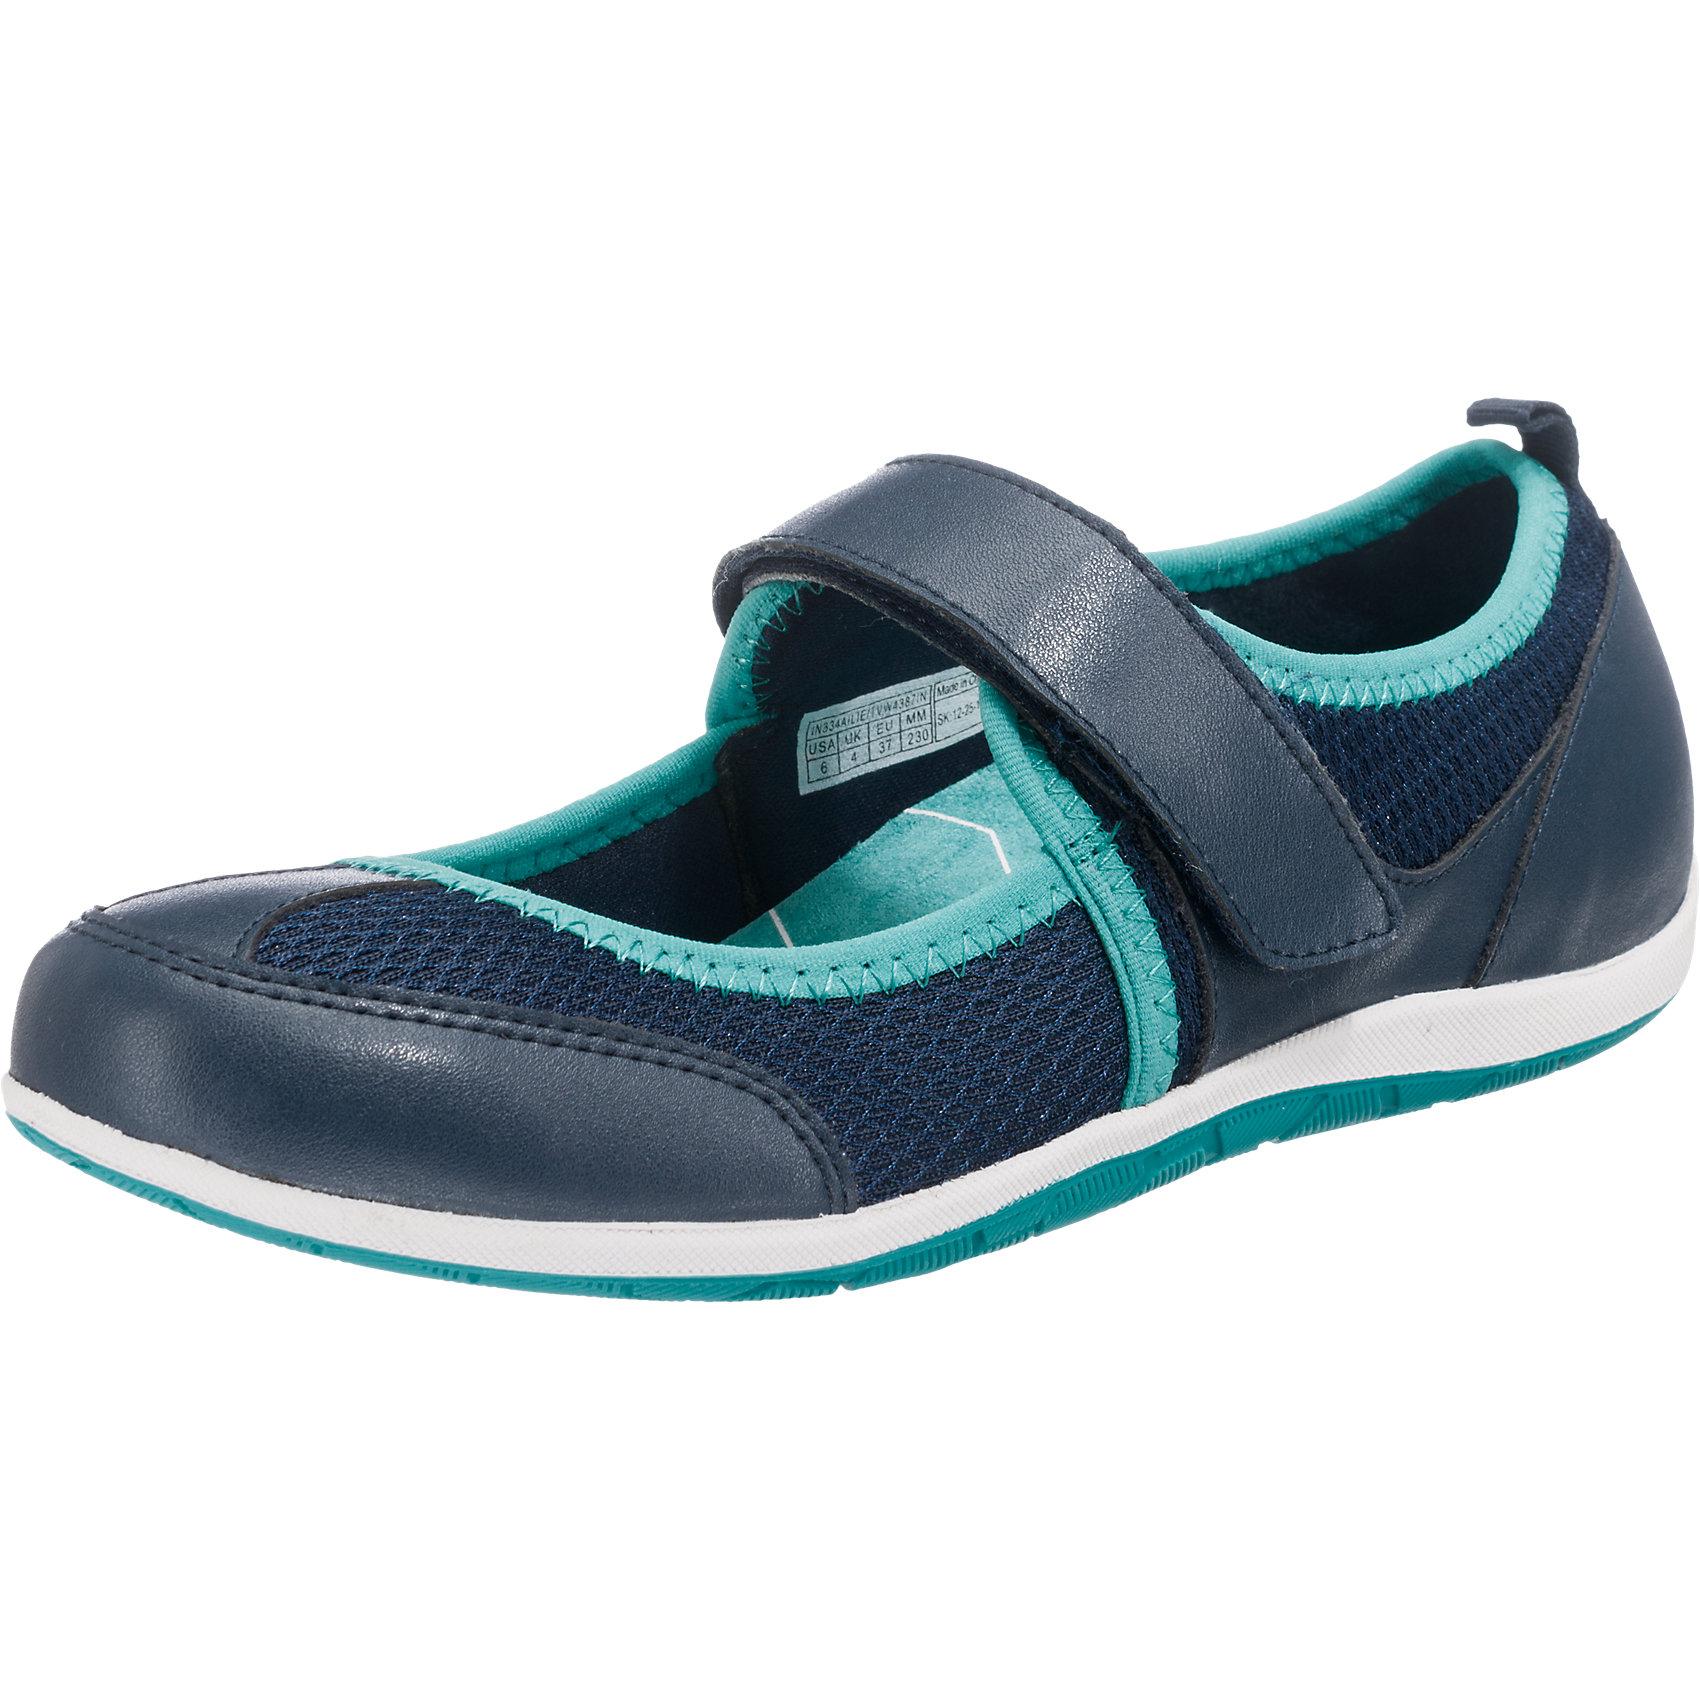 Neu Vionic Ailie Ballerinas blau 5752900